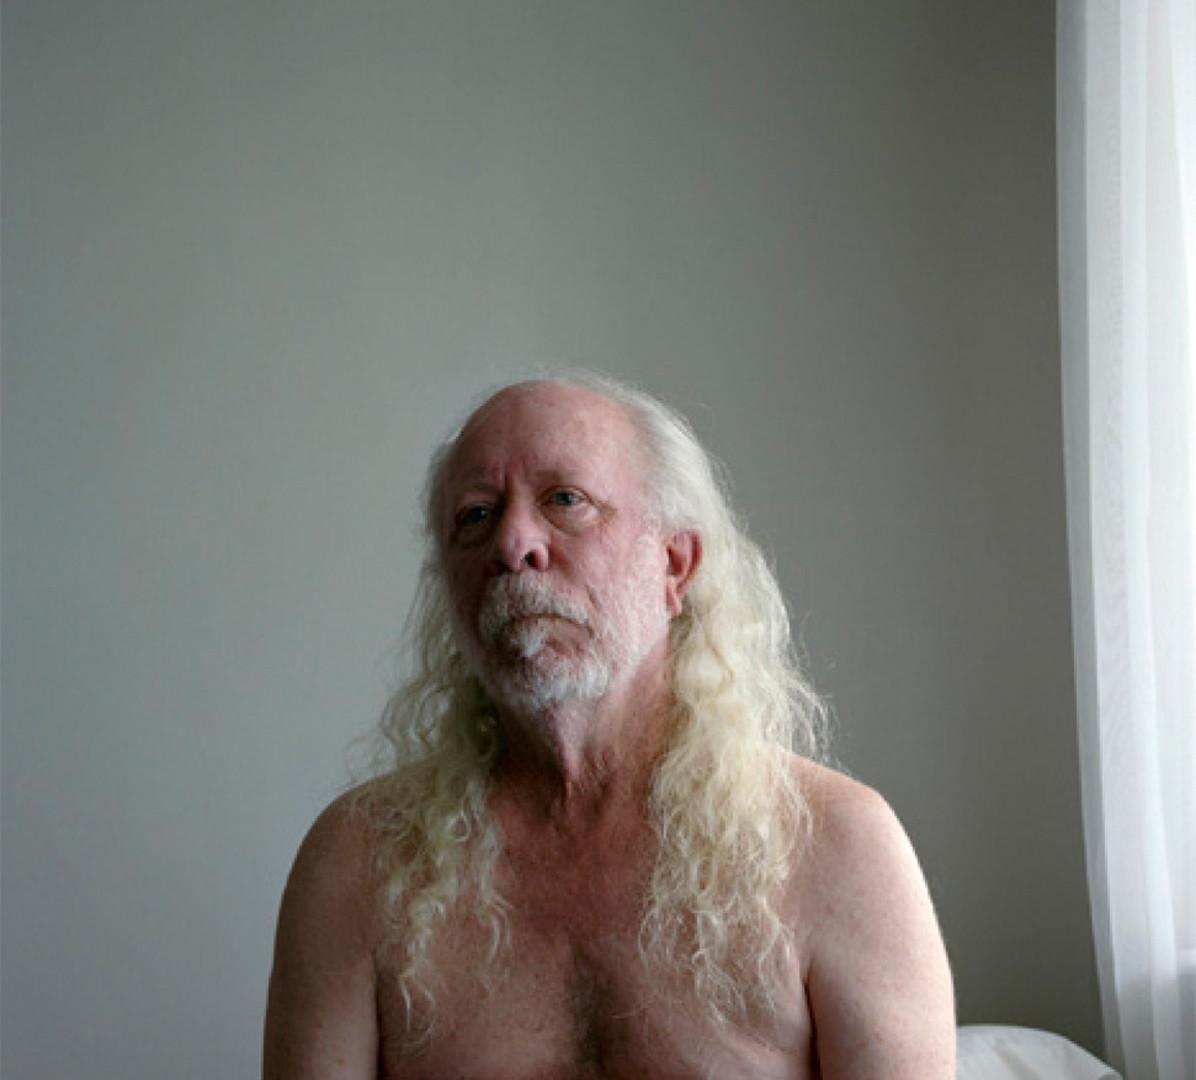 Jocelyn Lee, Untitled (Allan Edgar in Albuquerque), 2009